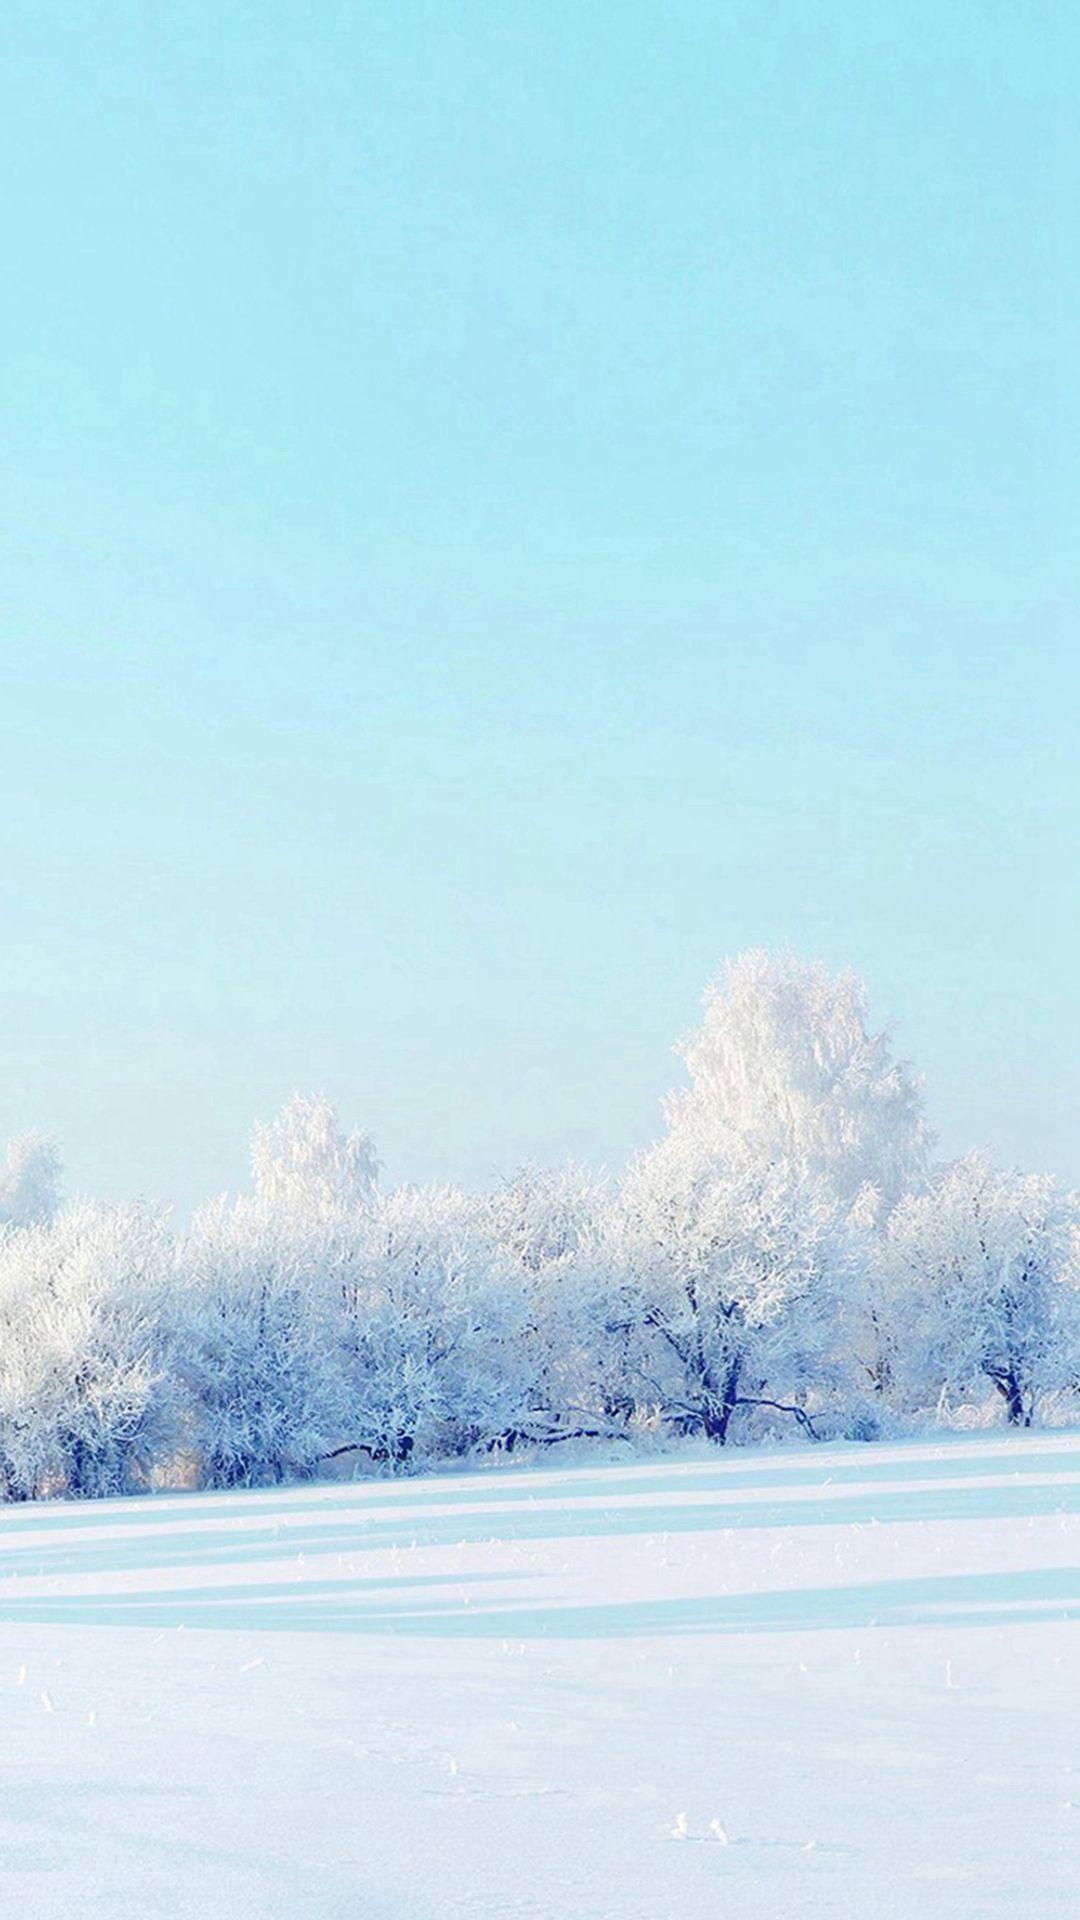 Pure Winter Static Snow Field White World Iphone 6 Plus